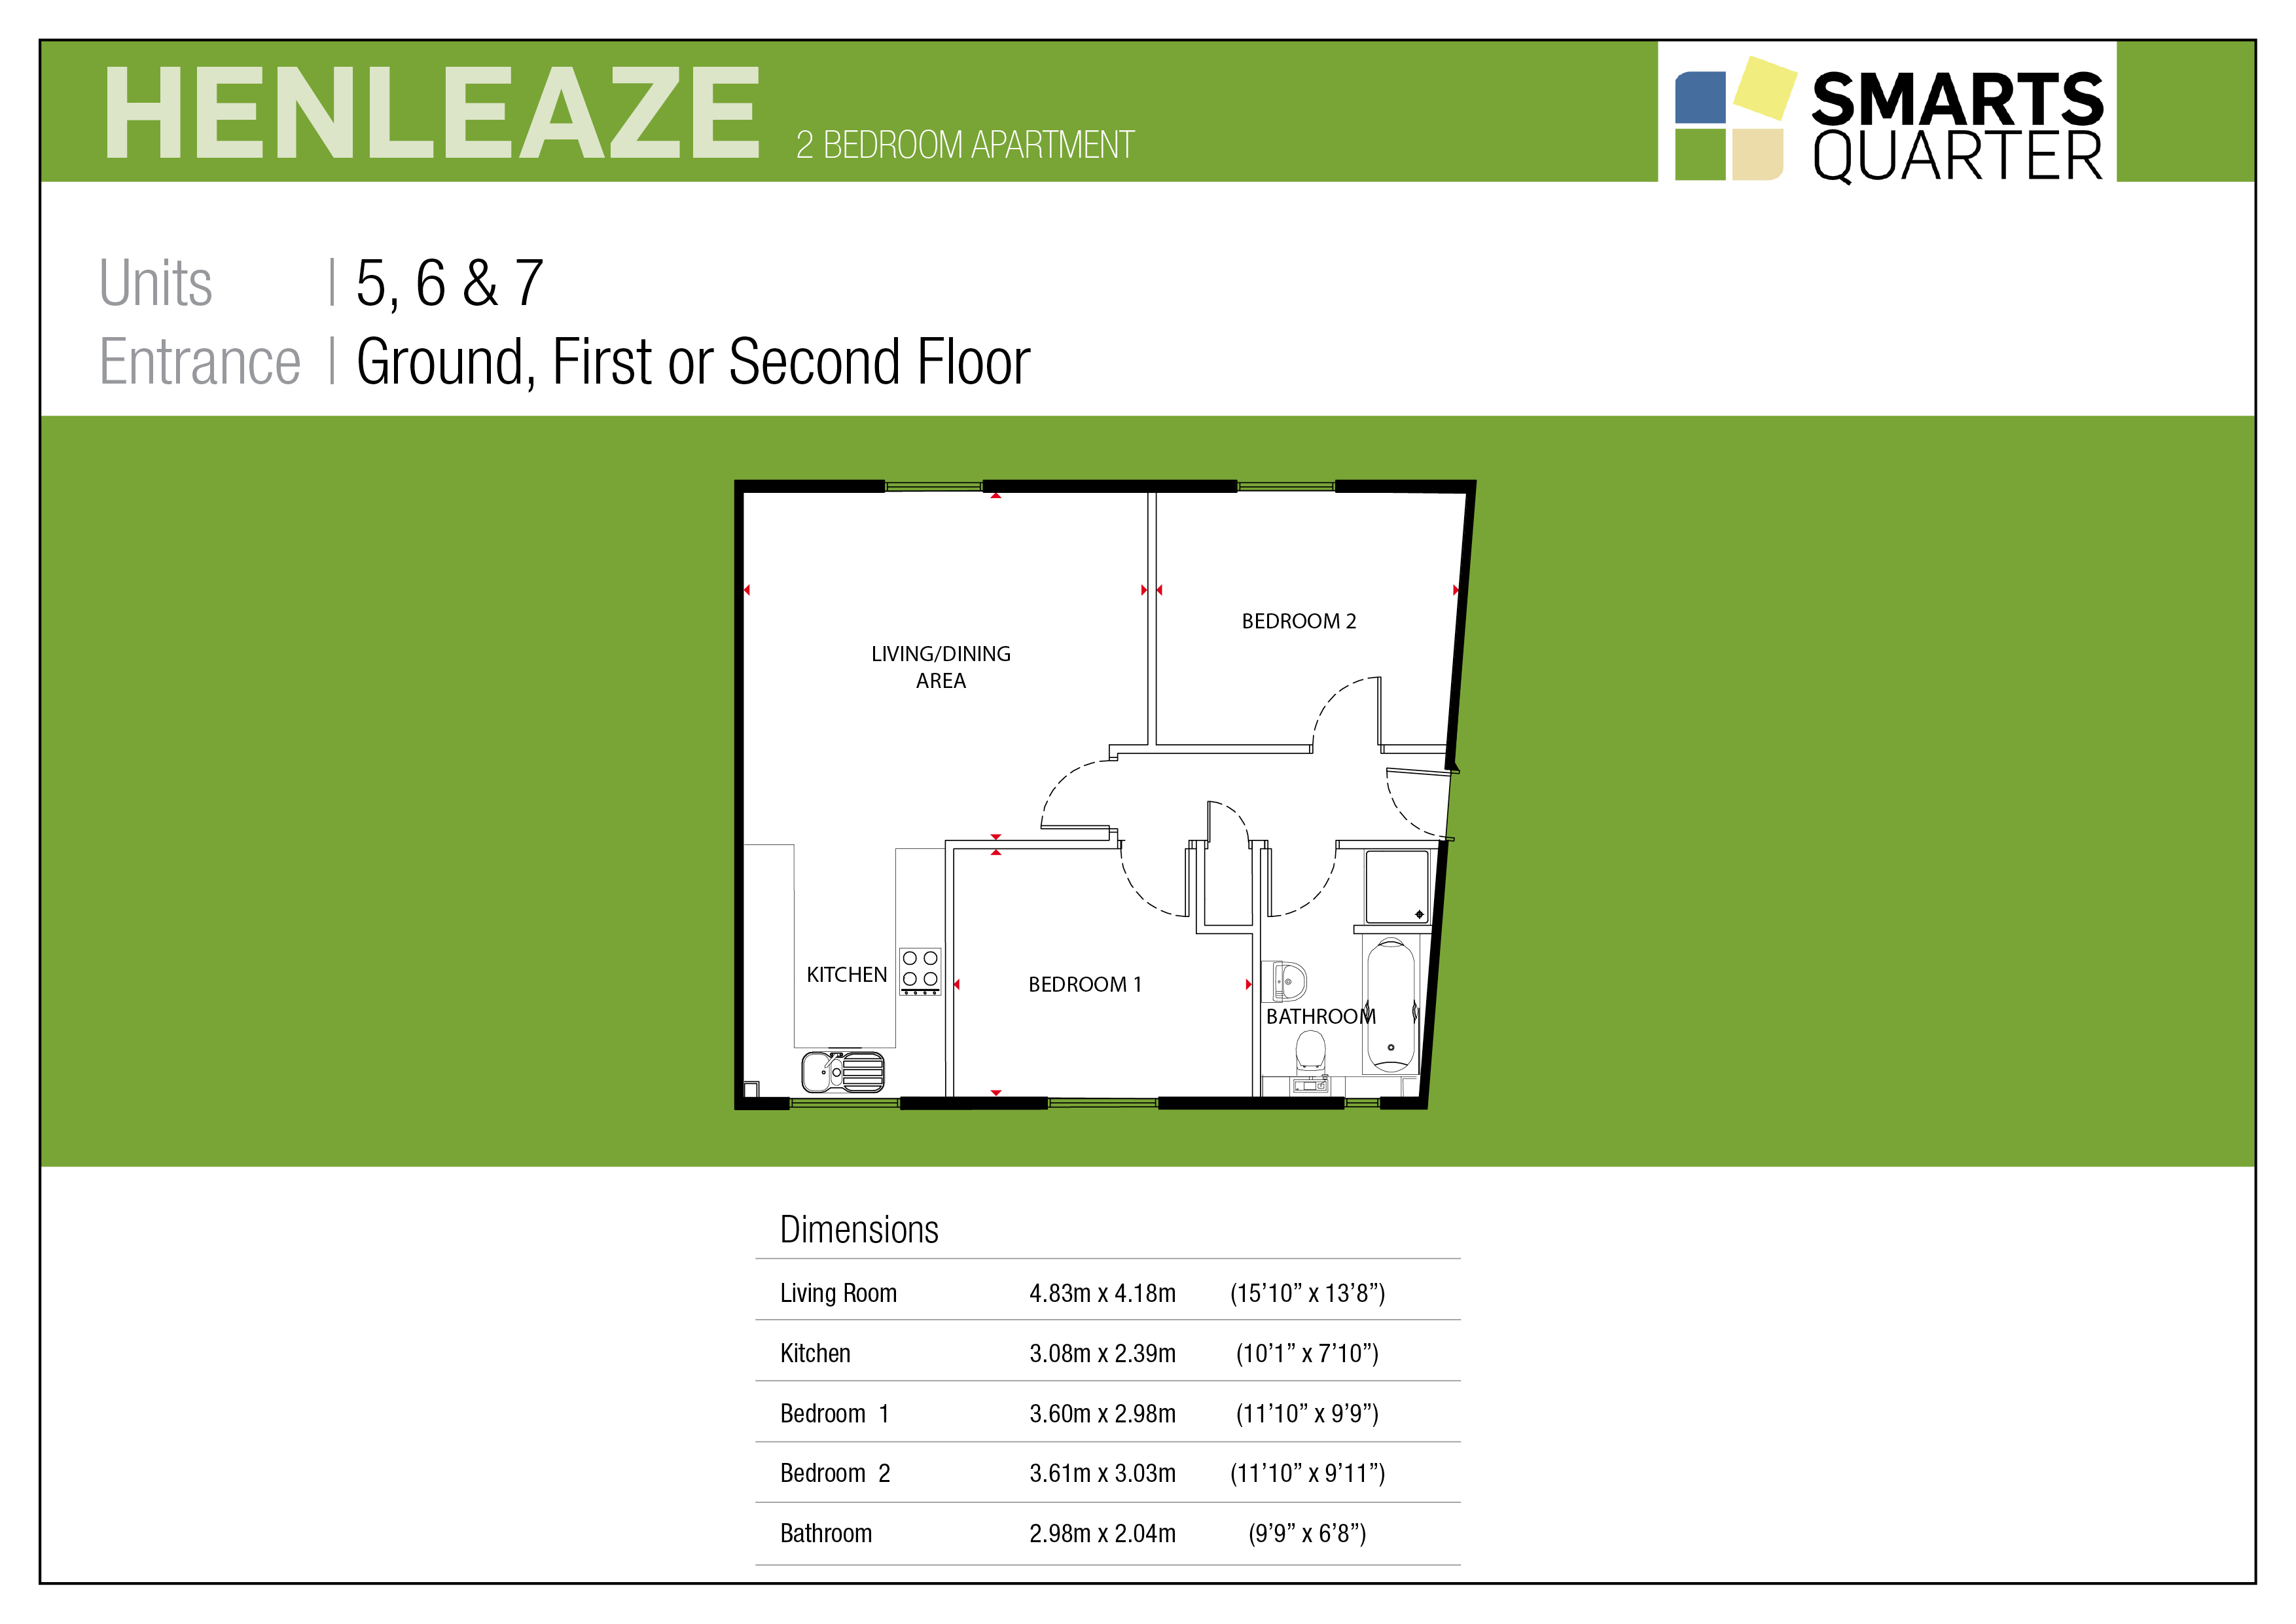 Henleaze Apartment Floor Plan in the New Smarts Quarter Development Bristol